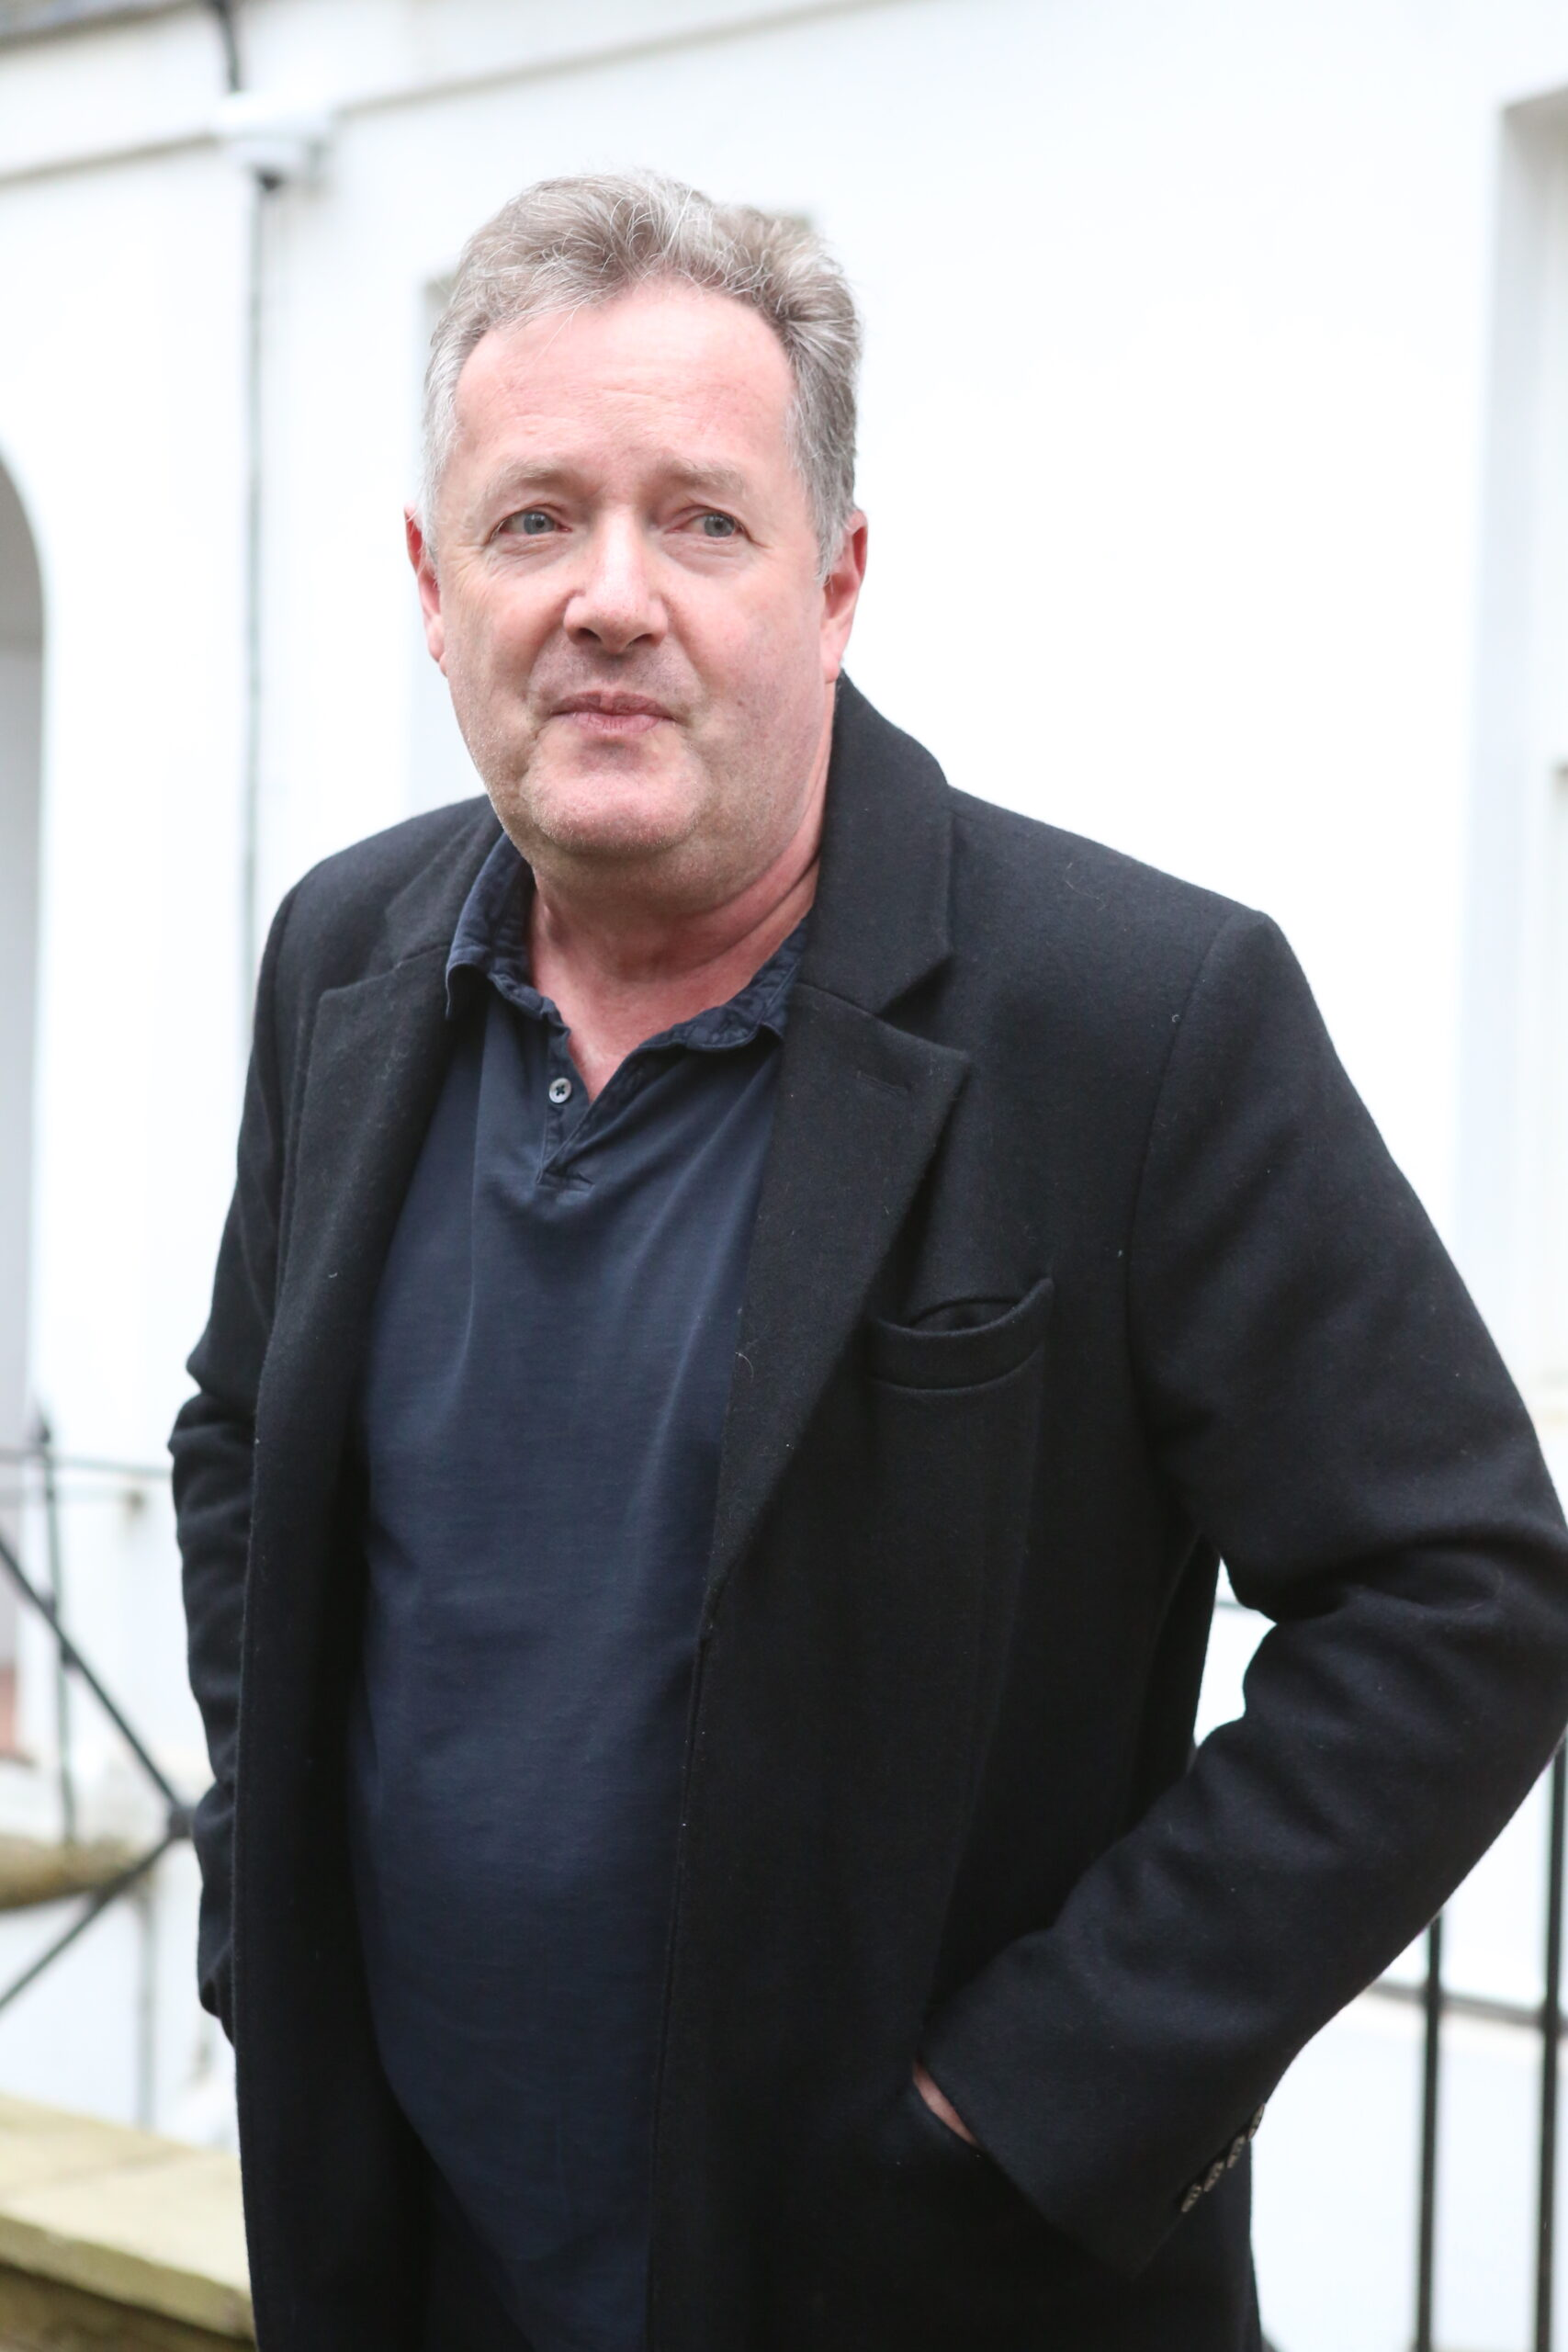 Piers Morgan on Matt Hancock kissing scandal